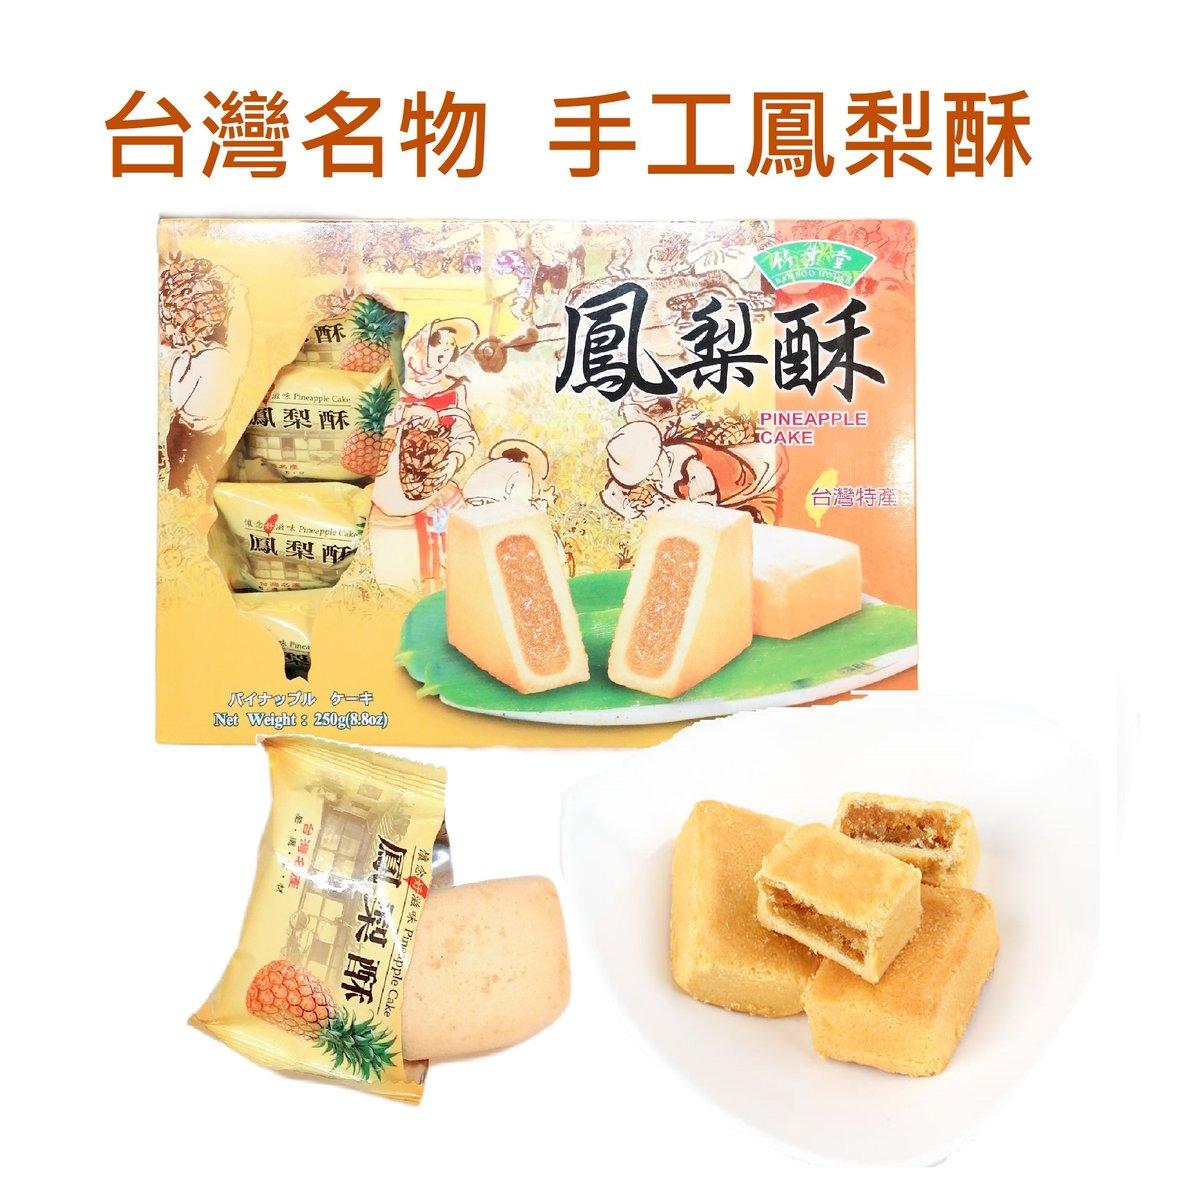 Taiwan Most Famous: Handmade Pineapple Cake (250g)